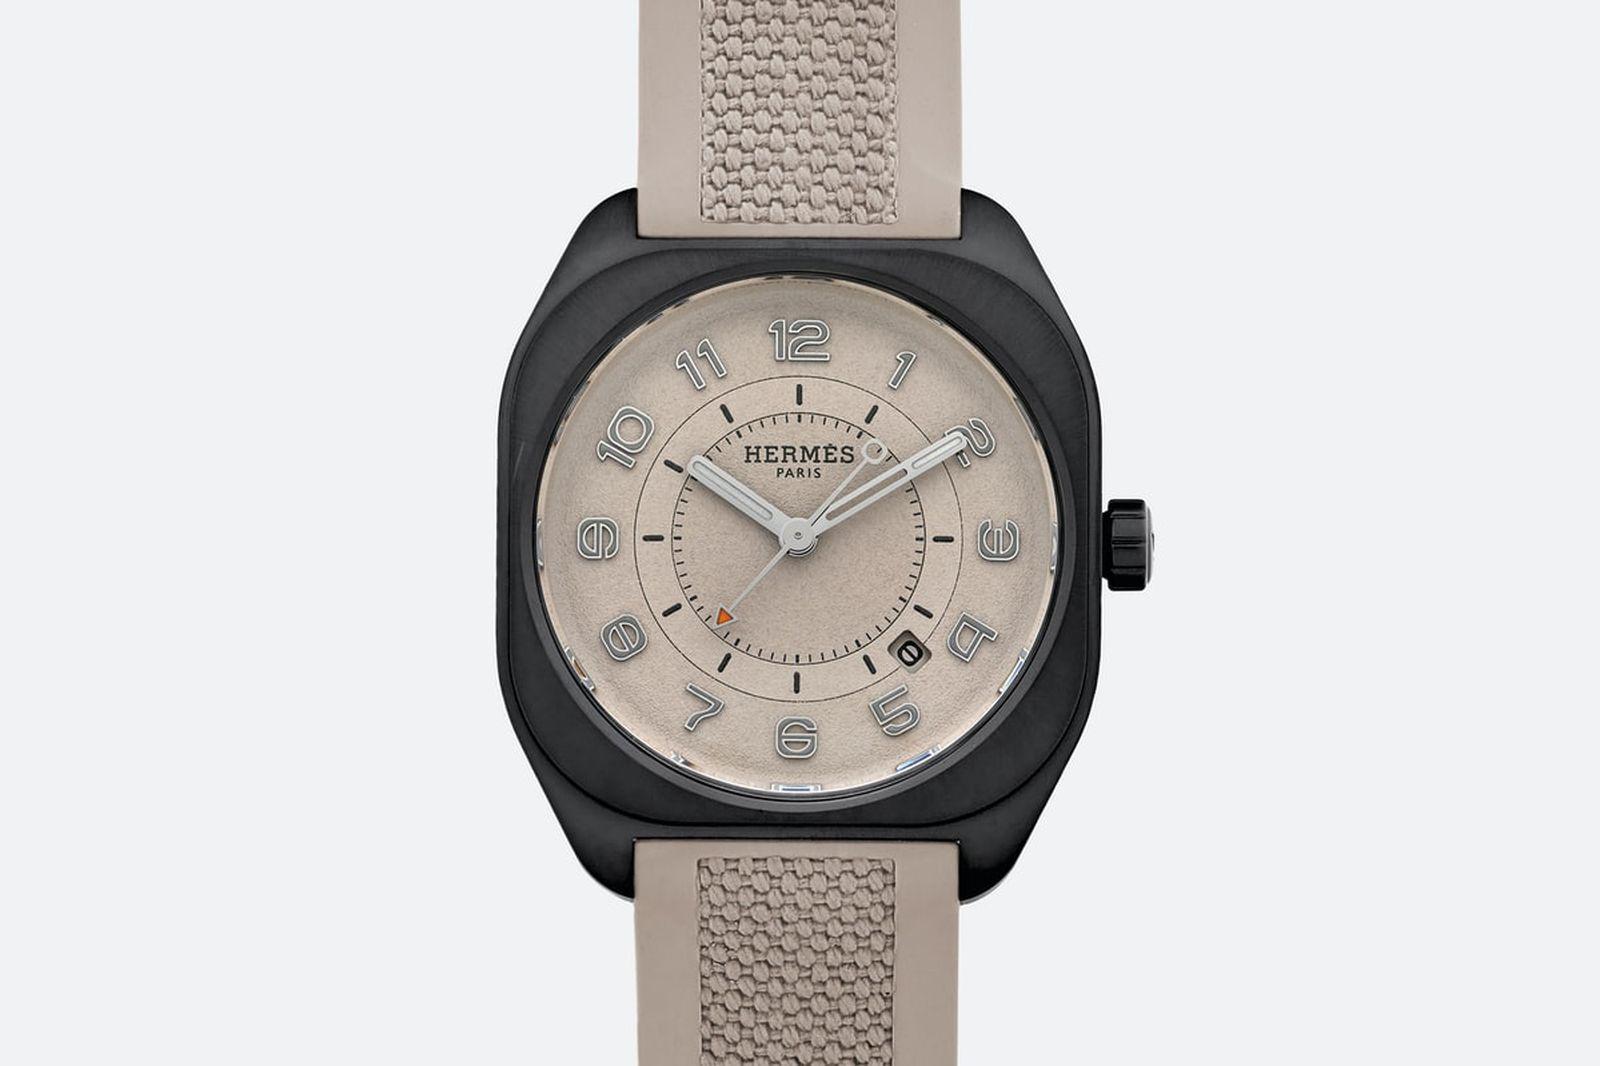 hermes-h08-hodinkee-watch (7)